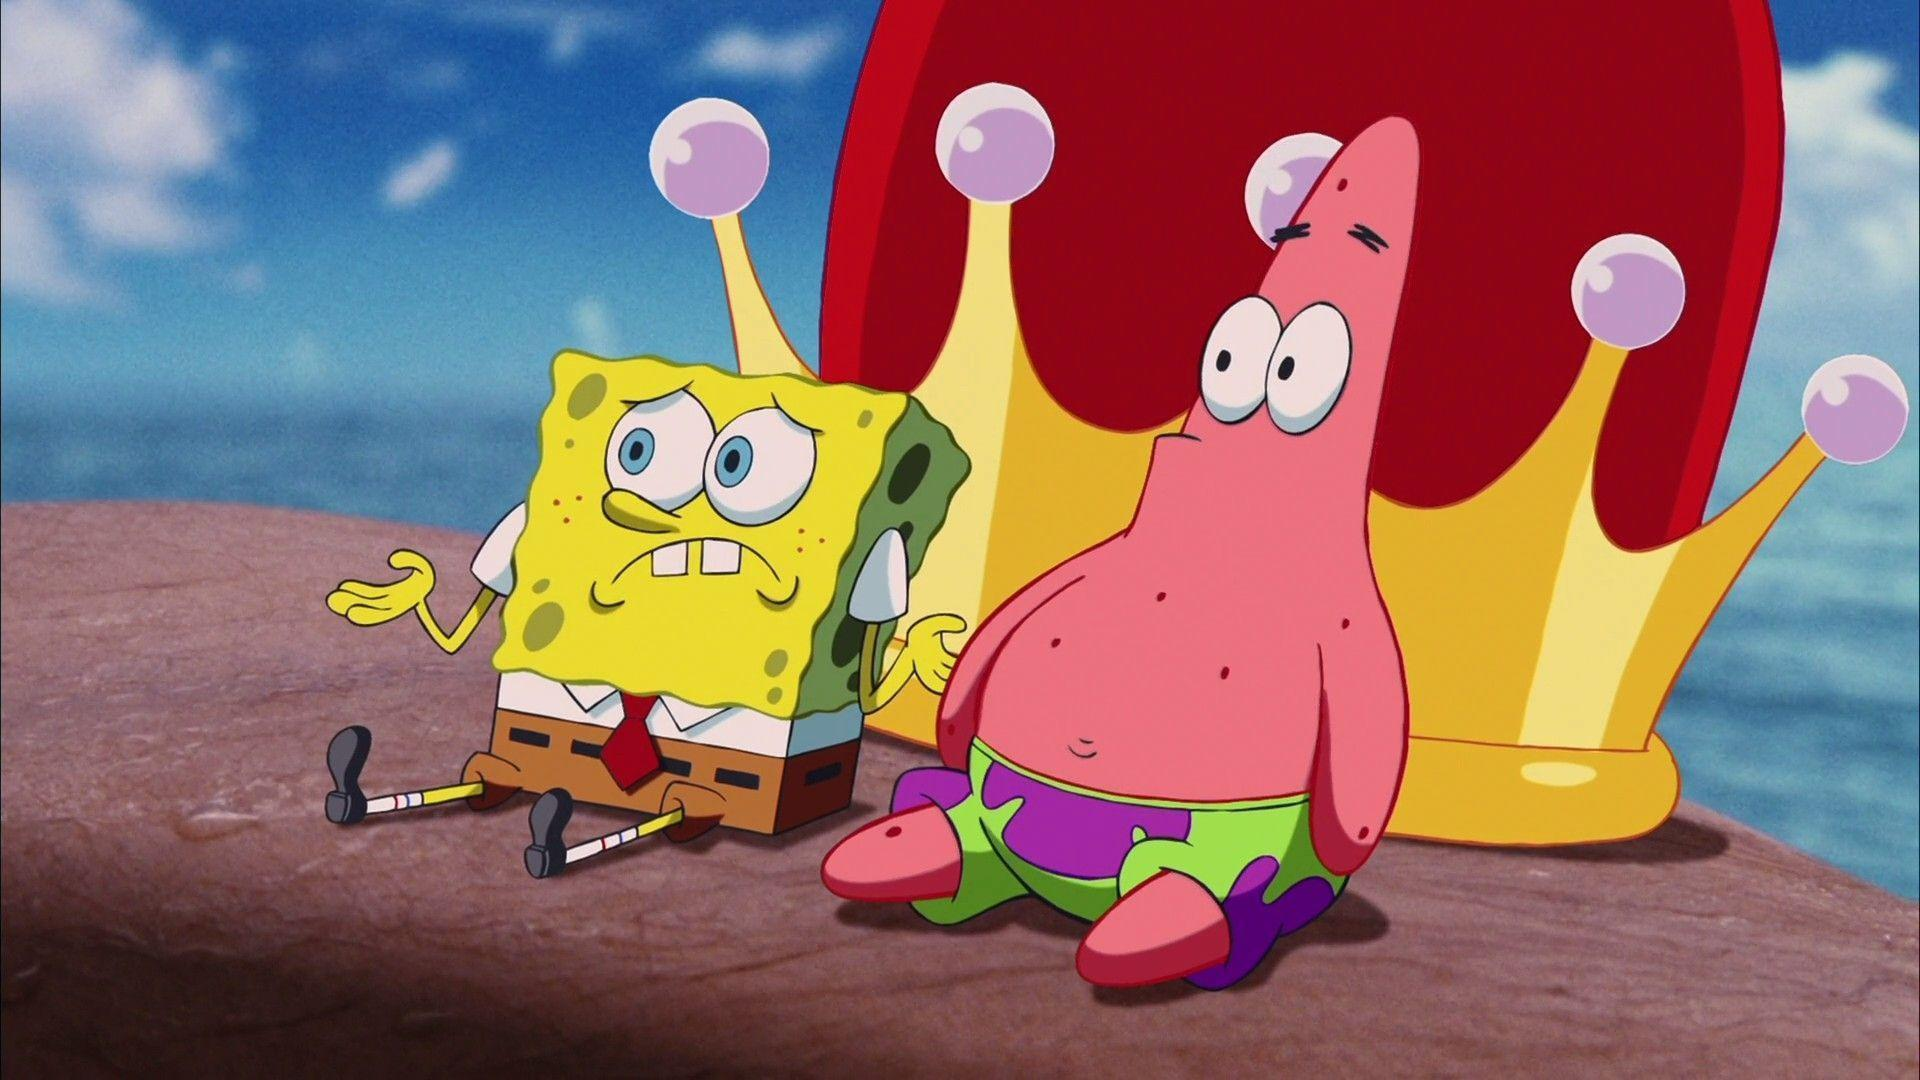 high resolution spongebob squarepants - photo #31